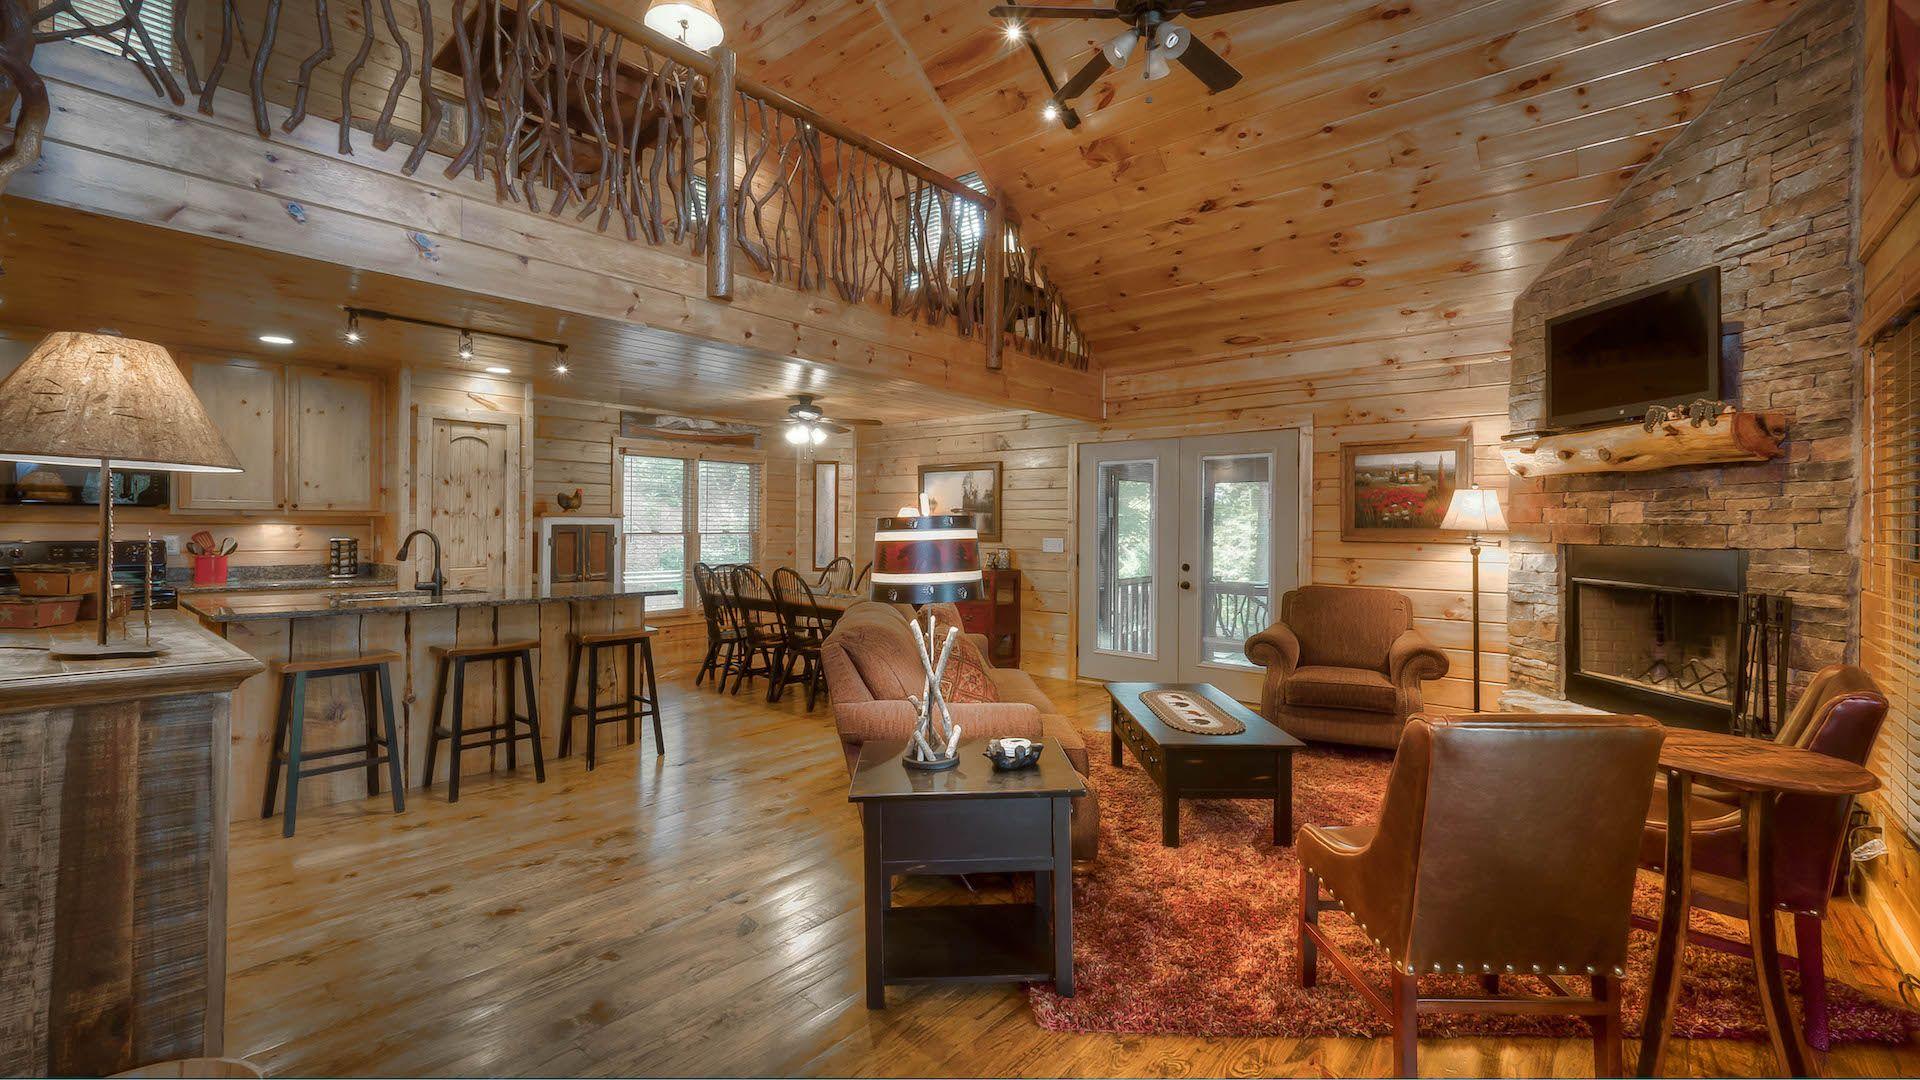 Fightingtown Creek Lodge Rental Cabin Blue Ridge Ga Lodge Rentals Cabin Outdoor Wood Burning Fireplace